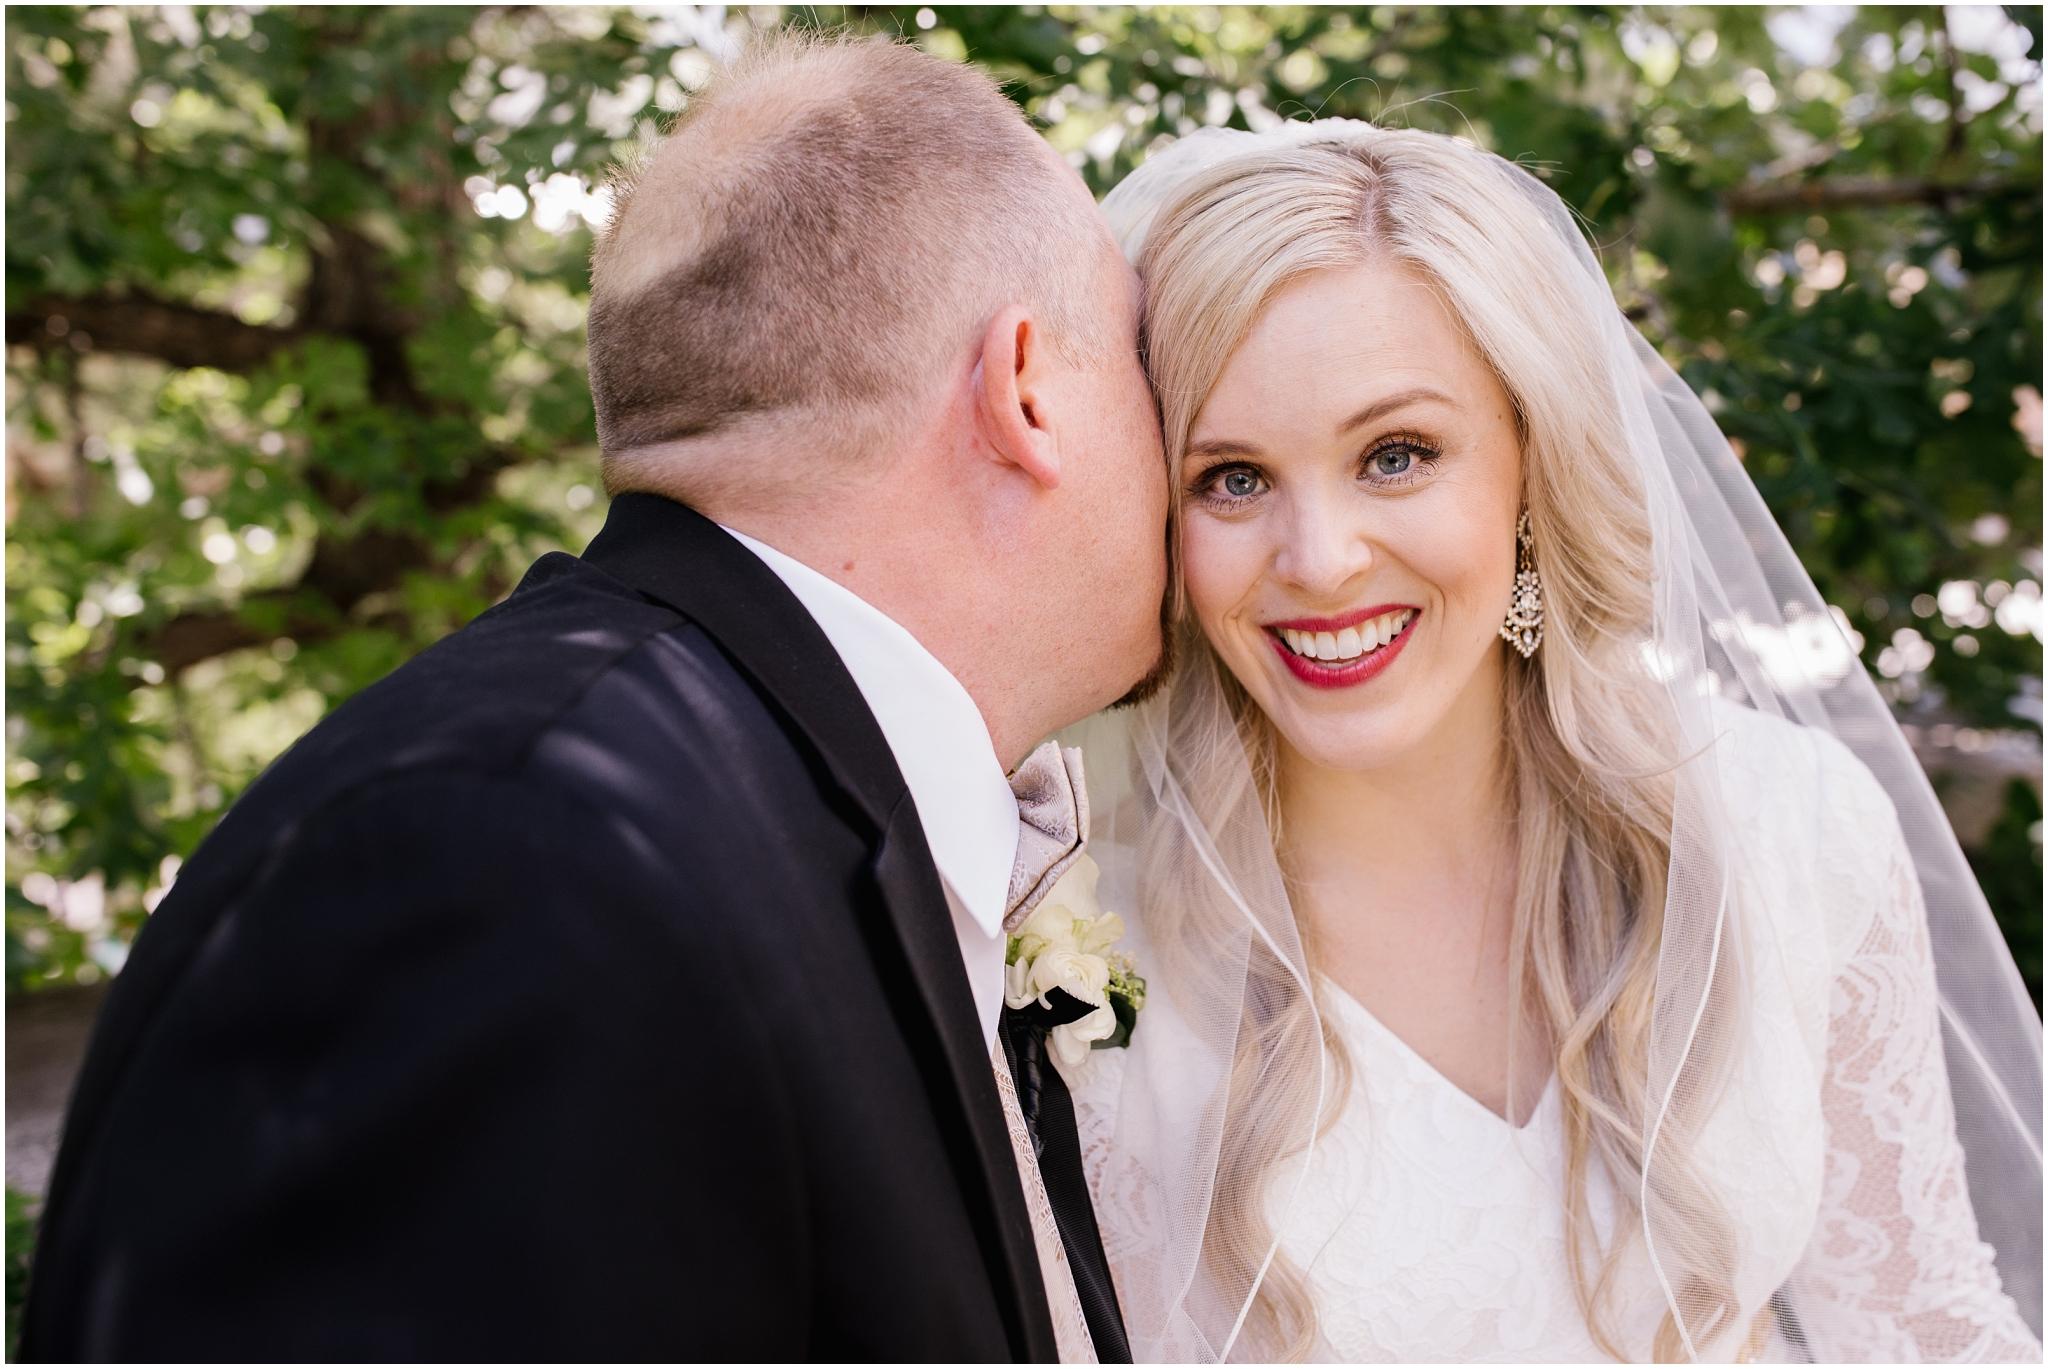 CherylandTyler-210_Lizzie-B-Imagery-Utah-Wedding-Photographer-Salt-Lake-City-Temple-Wells-Fargo-Building-Reception.jpg